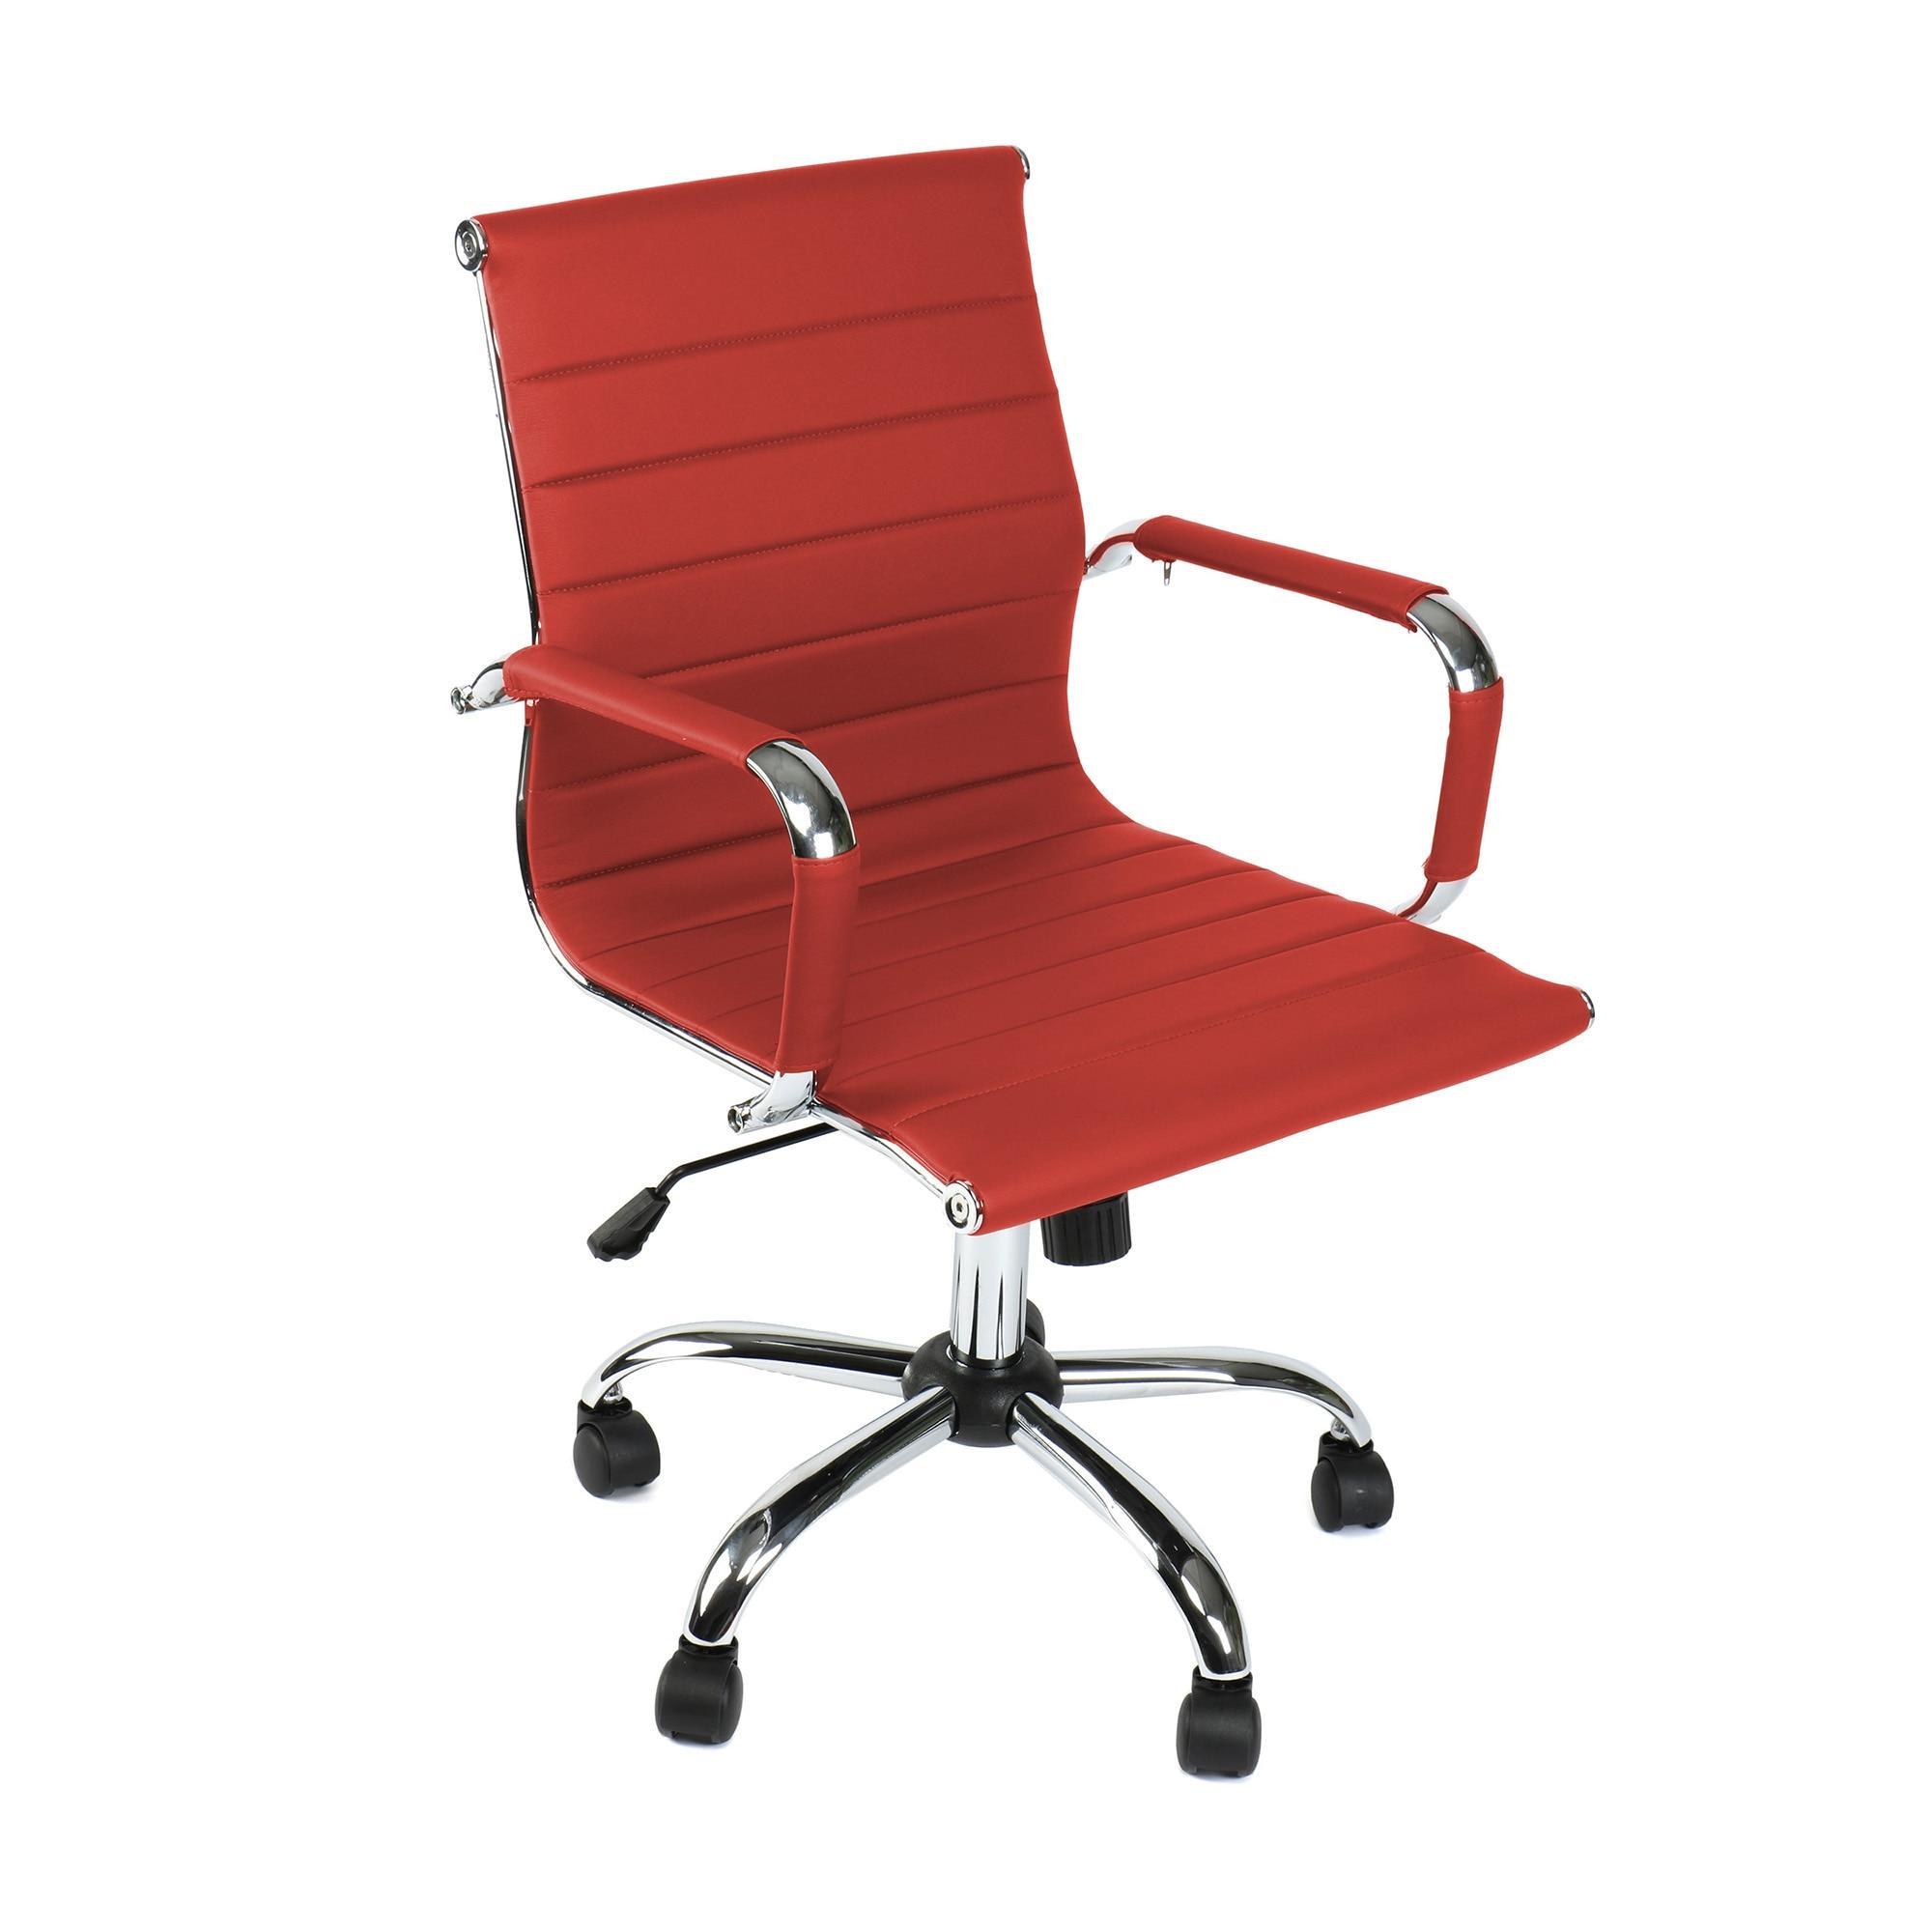 kring lear ergonomikus irodai szék